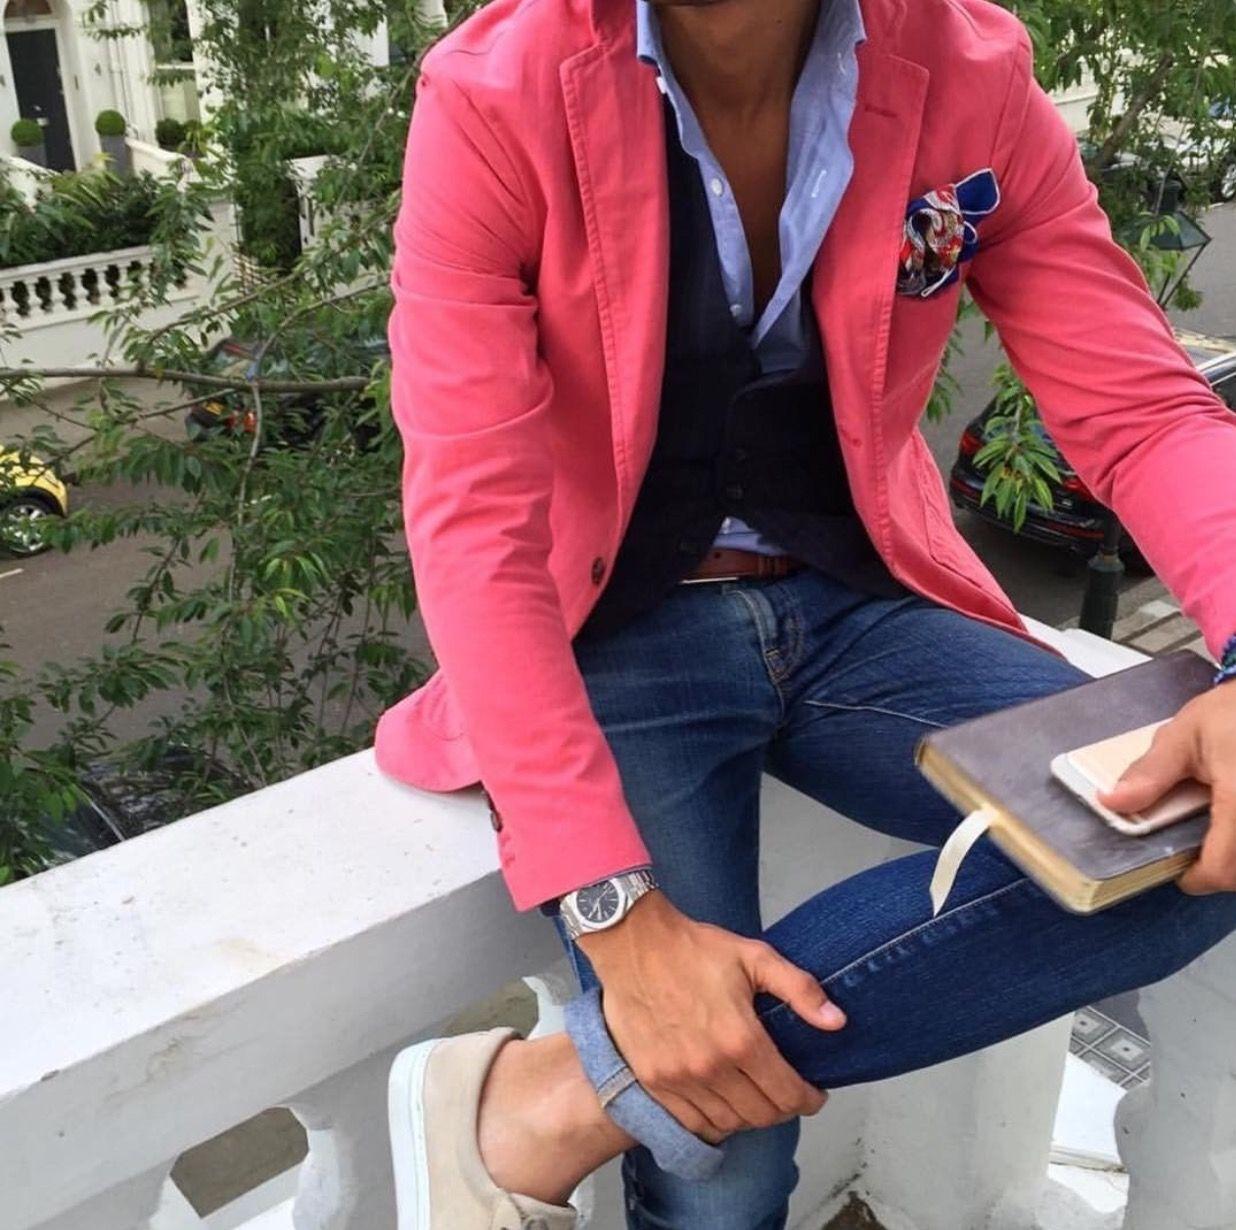 Coloring London #Summer #look details #Casual #Sportswear #Fashion #Menfashion #Menstyle #Class #Lookcool #Casualstyle #Trendy #Elegance #Menstyle #Luxury #Style #Street #Trendy #Dandy #Moda #Classy #Awesome #Stylishmen #Cool #likeit